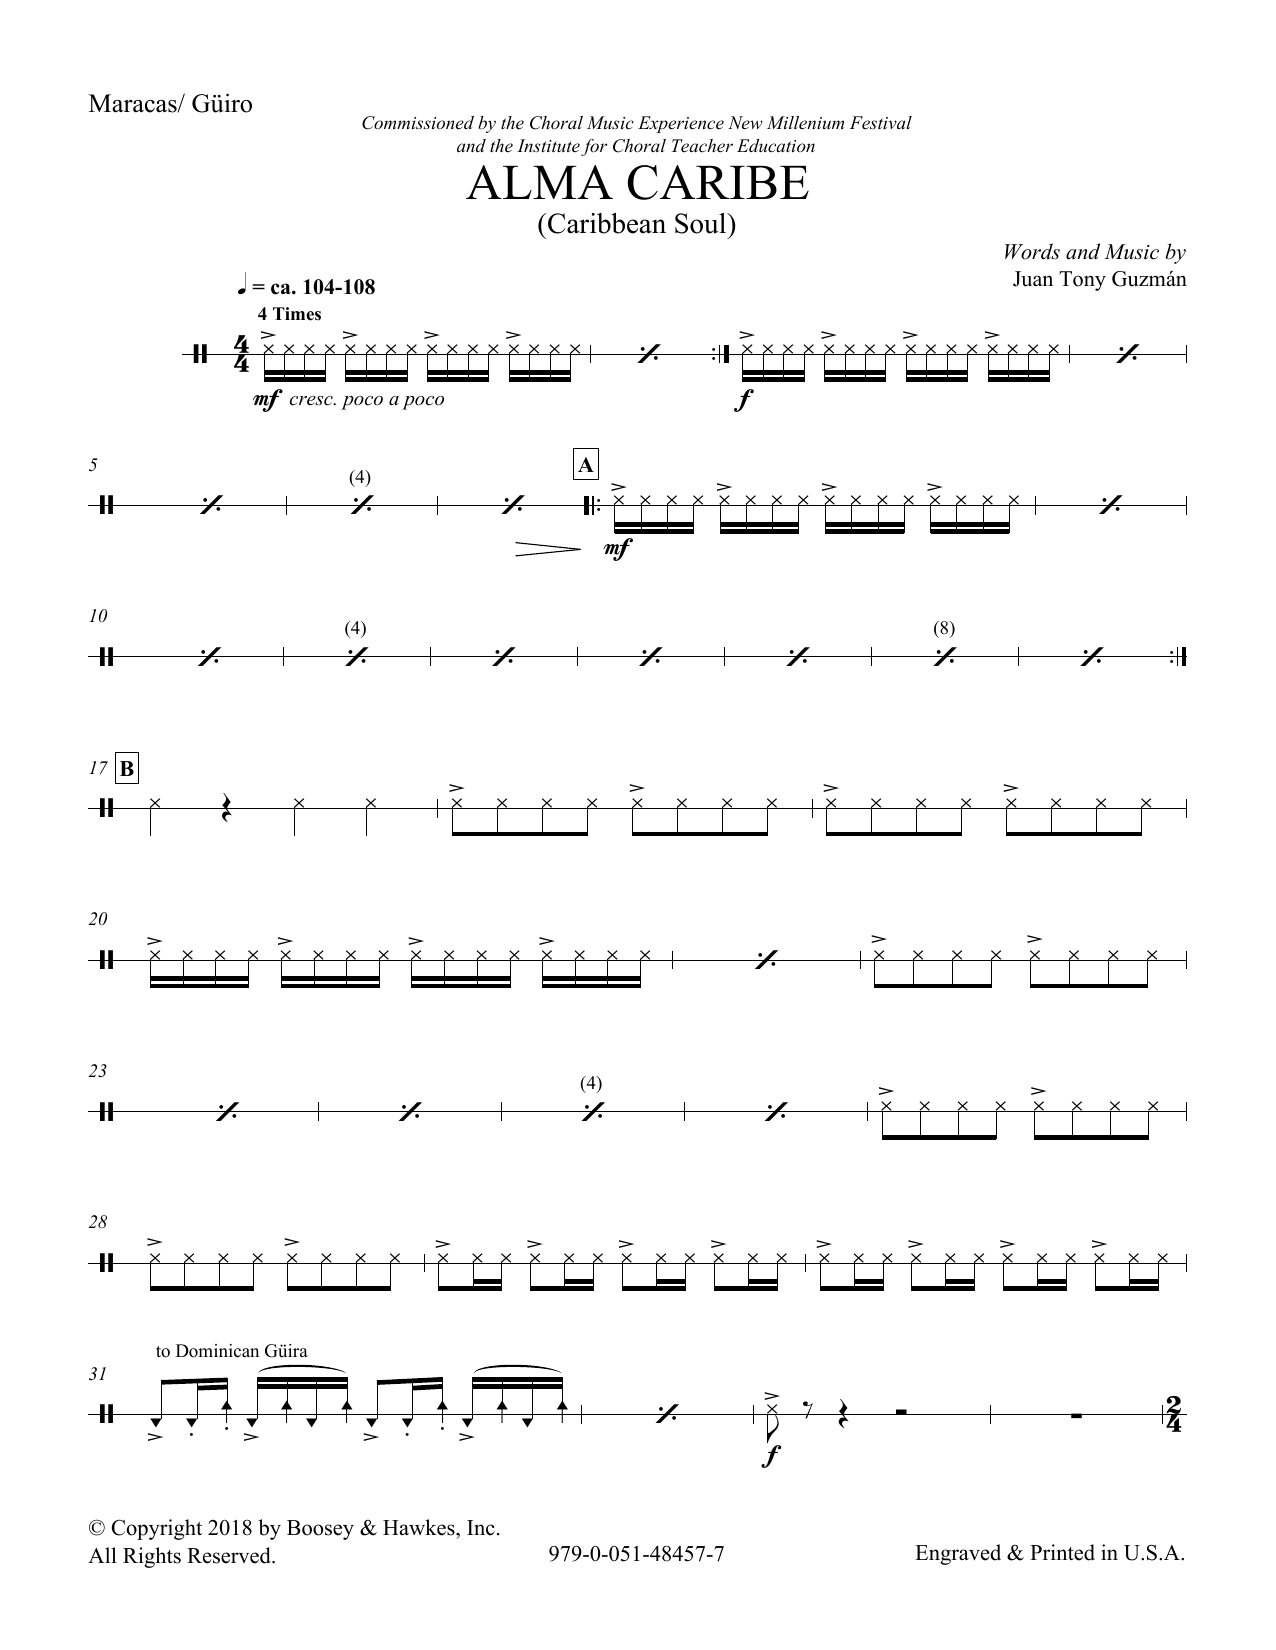 Download Juan Tony Guzman 'Alma Caribe (Caribbean Soul) - Guiro' Digital Sheet Music Notes & Chords and start playing in minutes